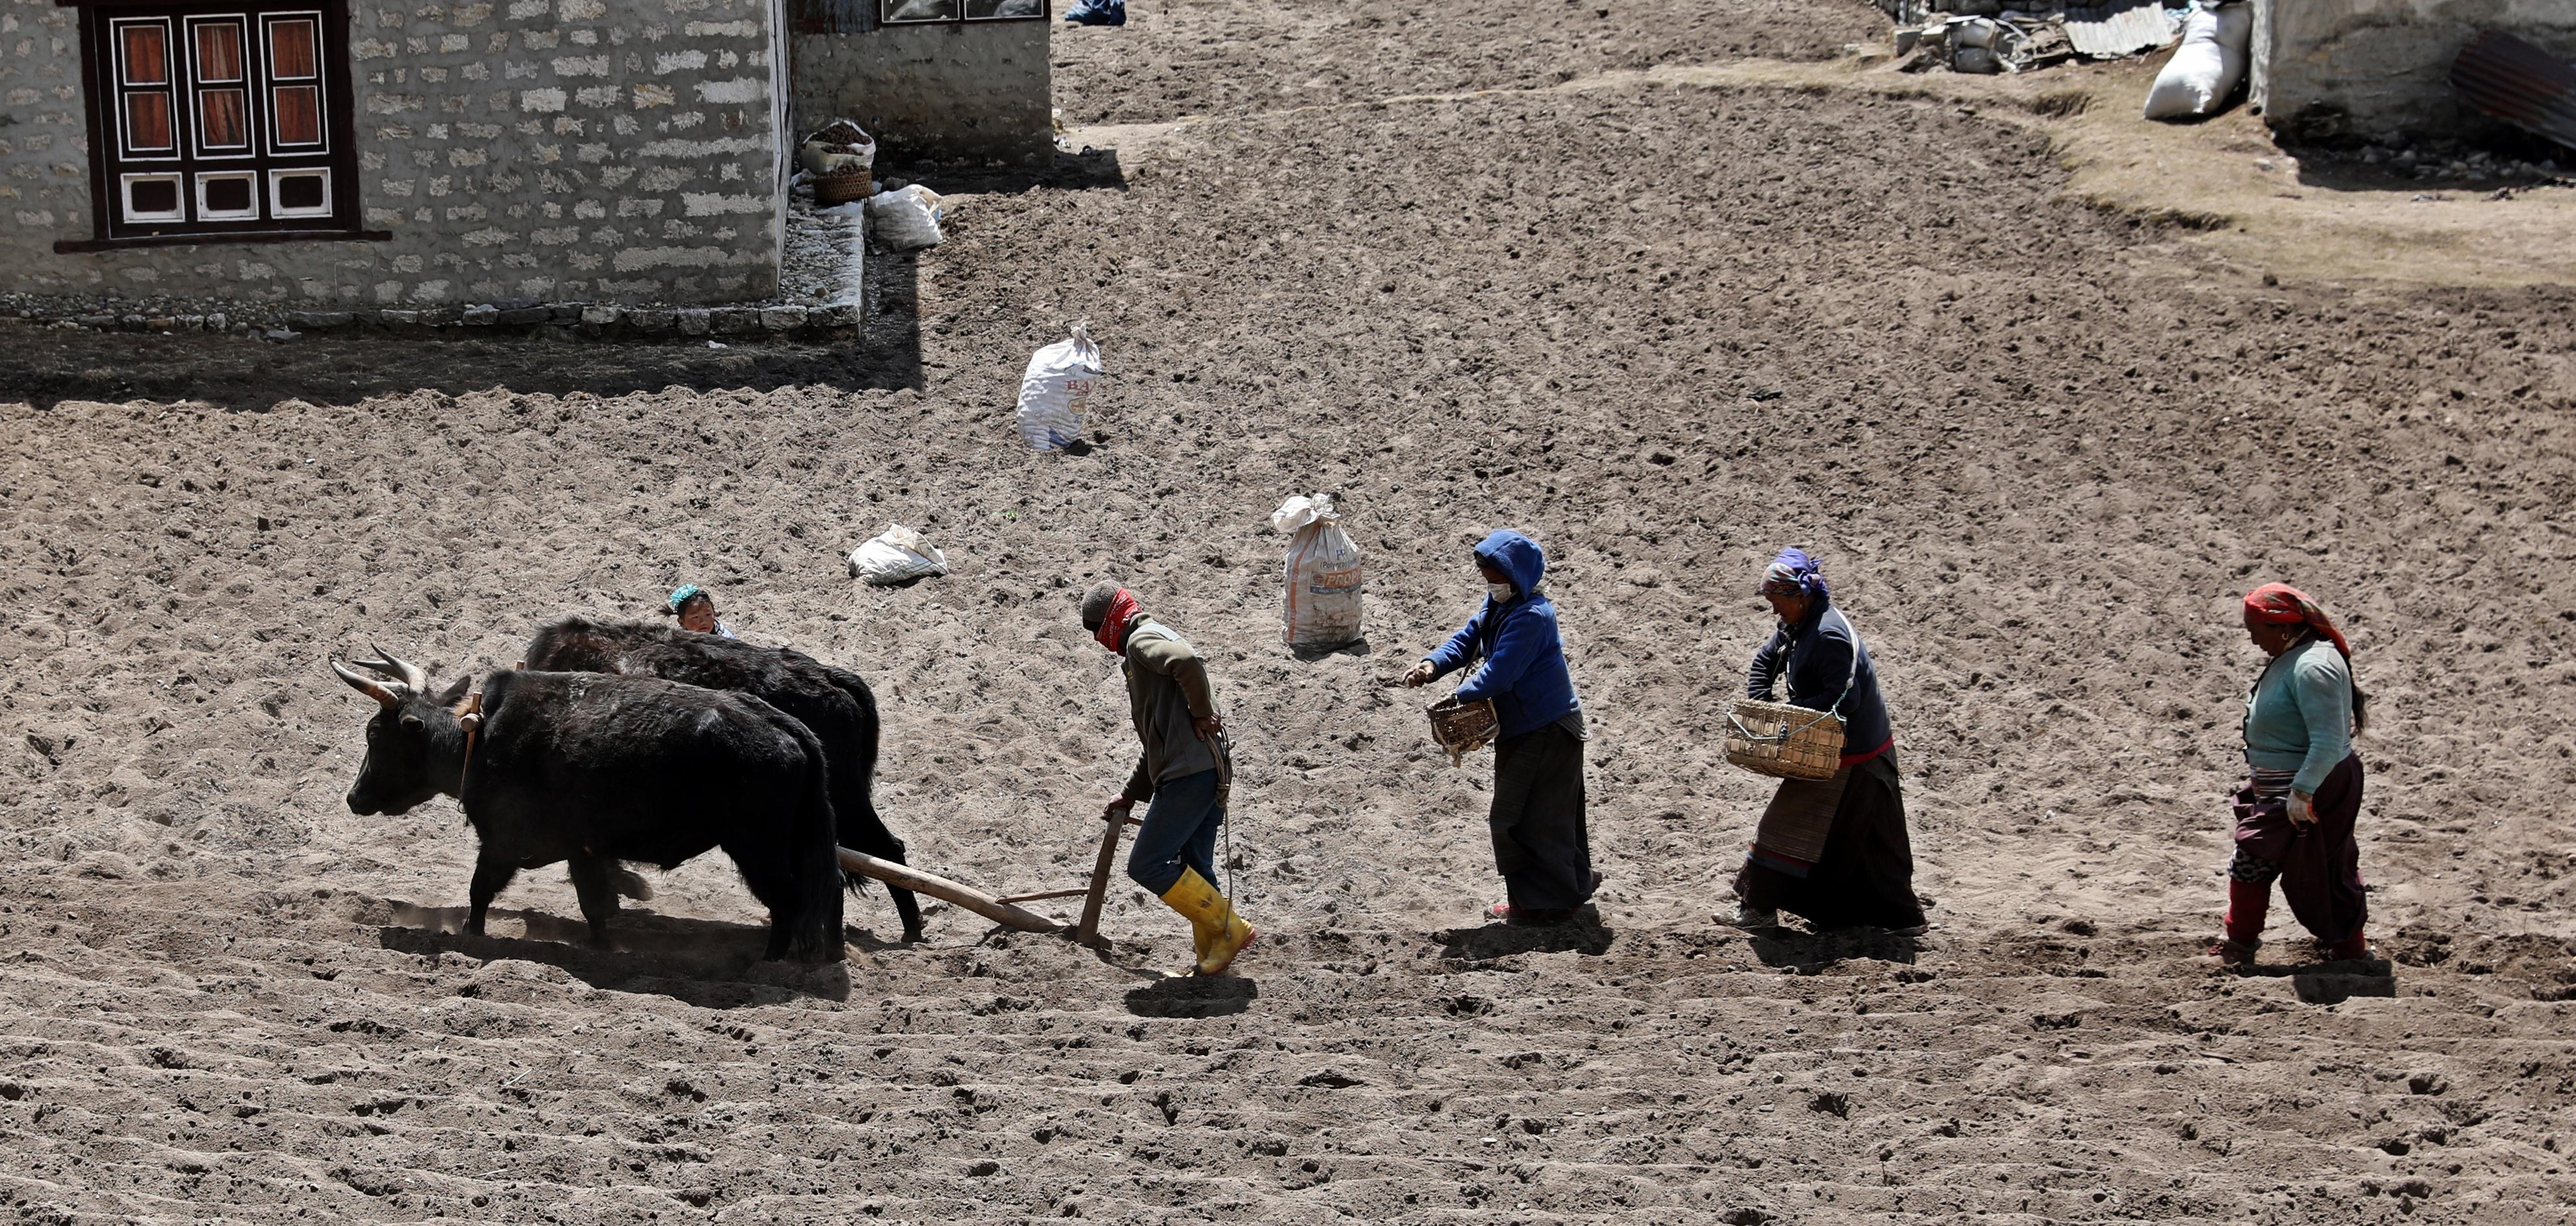 Dingboche villagers planting potatoes